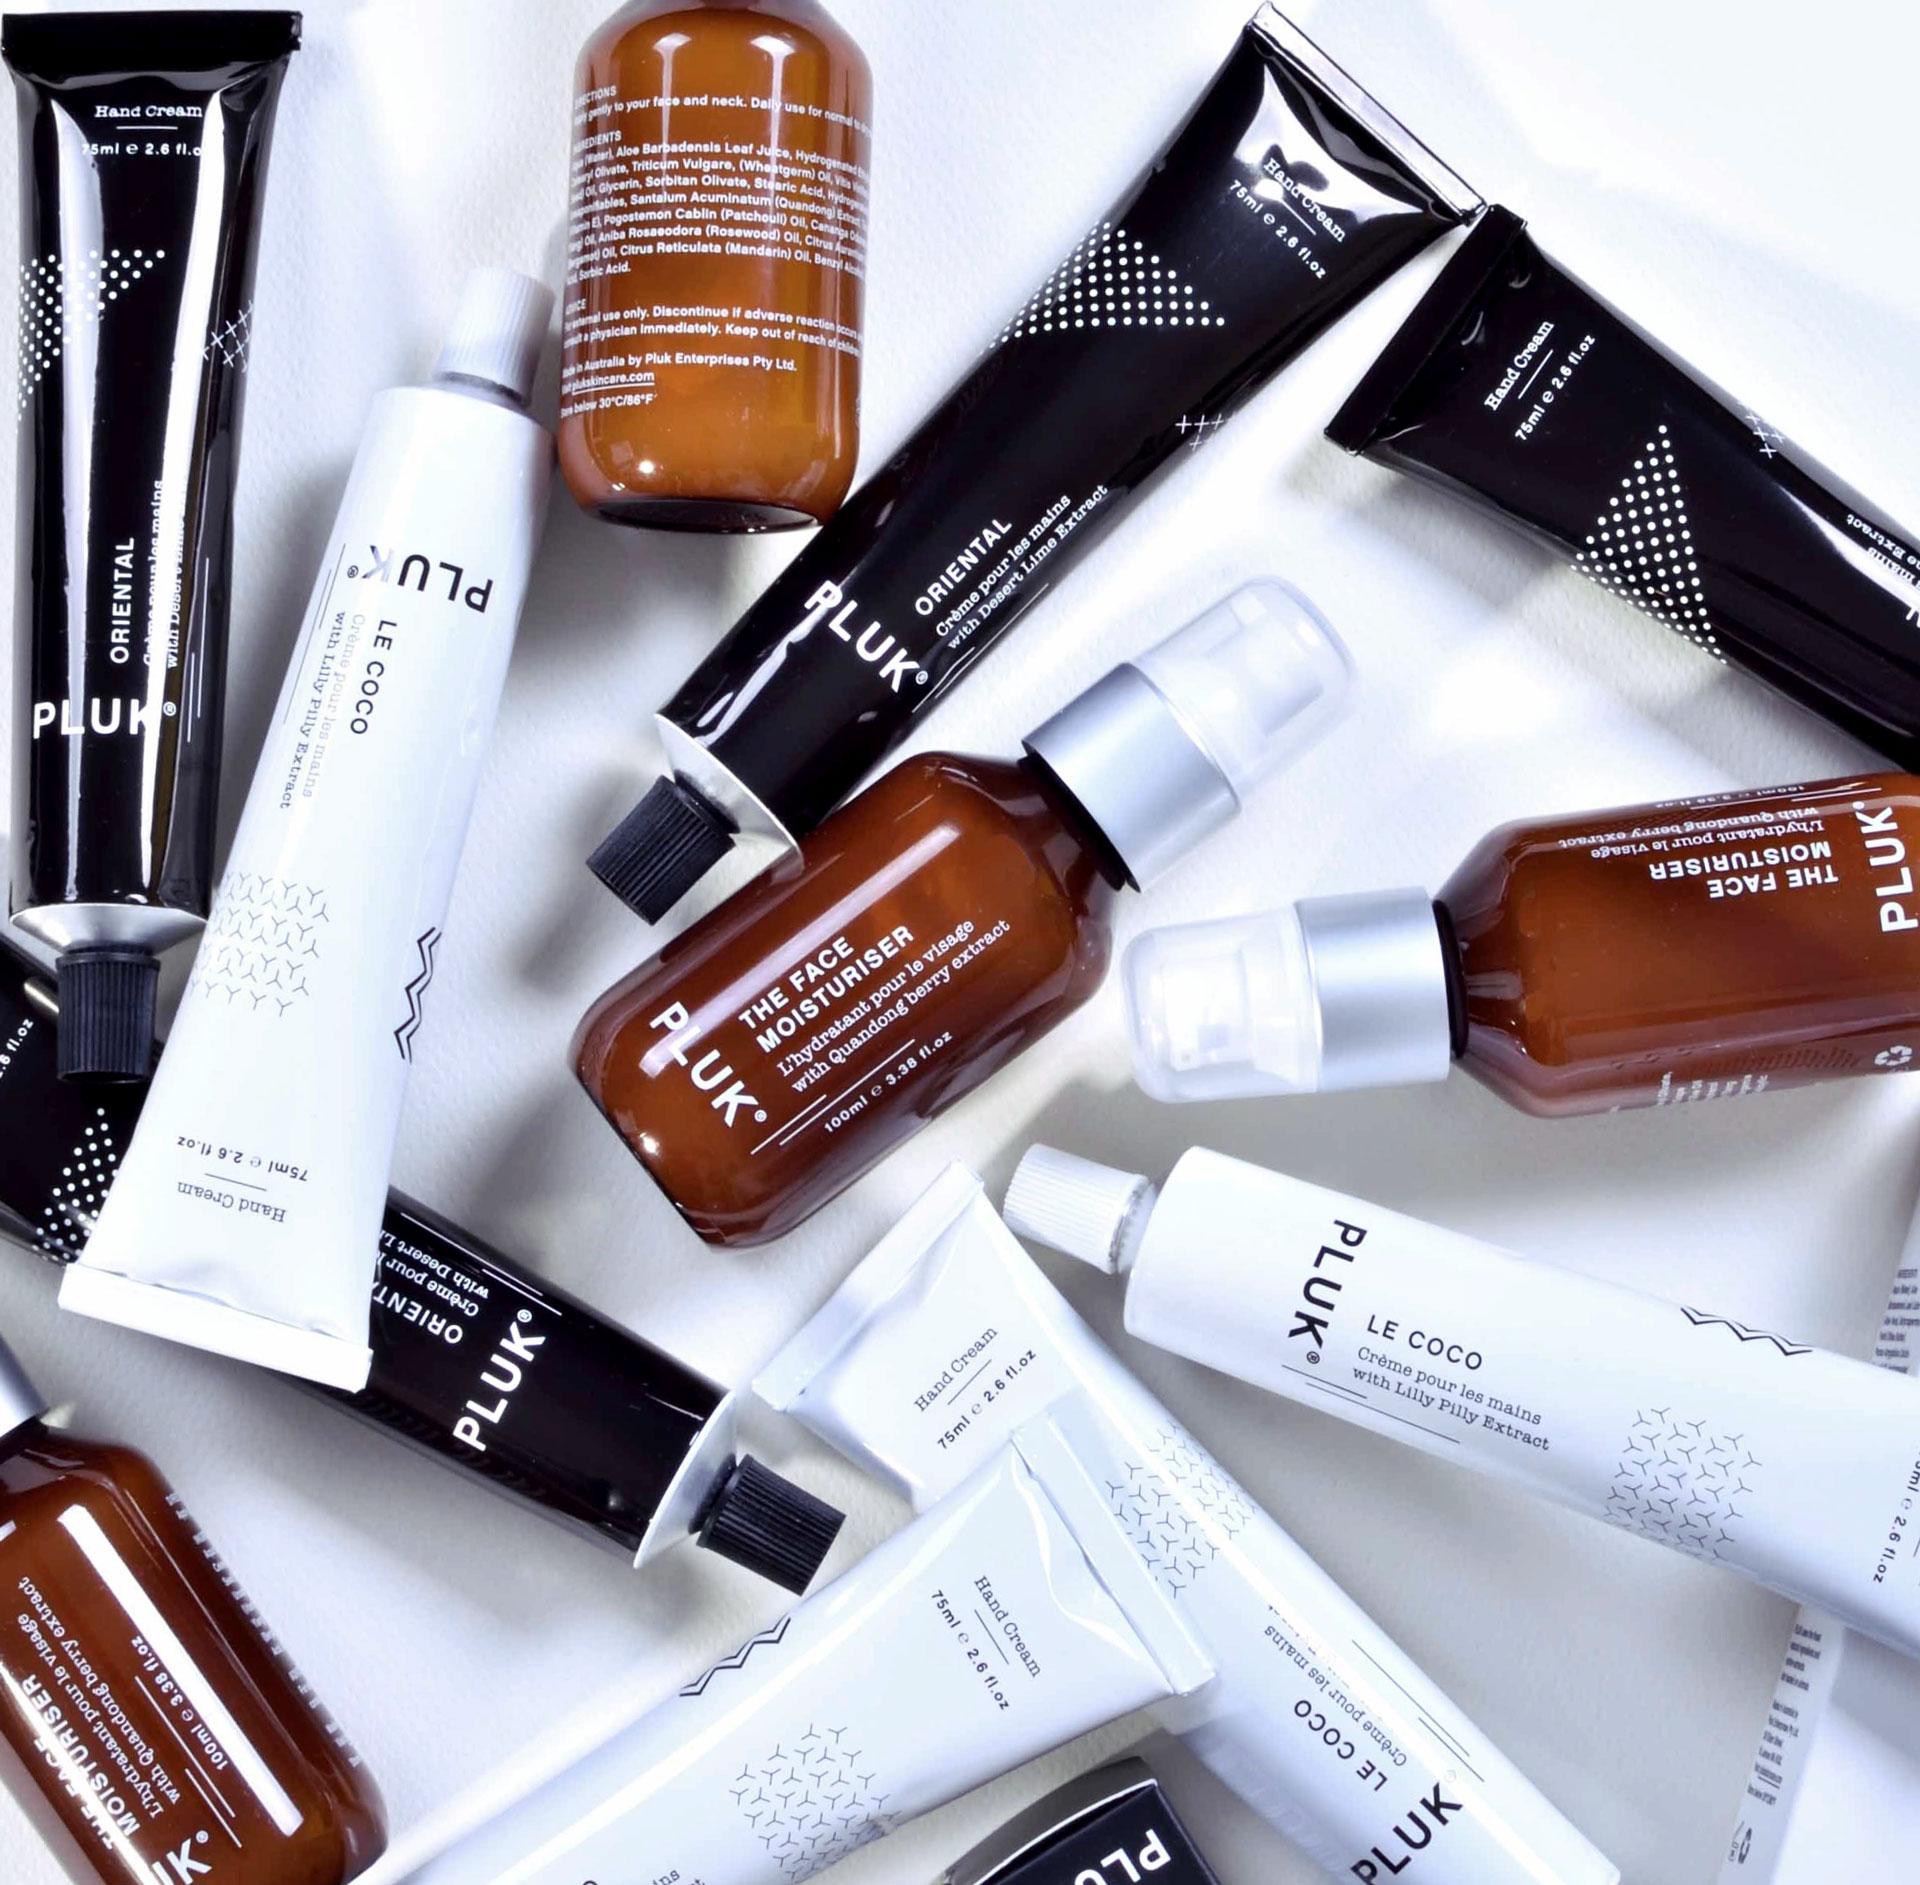 Pluk Skincare Australia Product Range